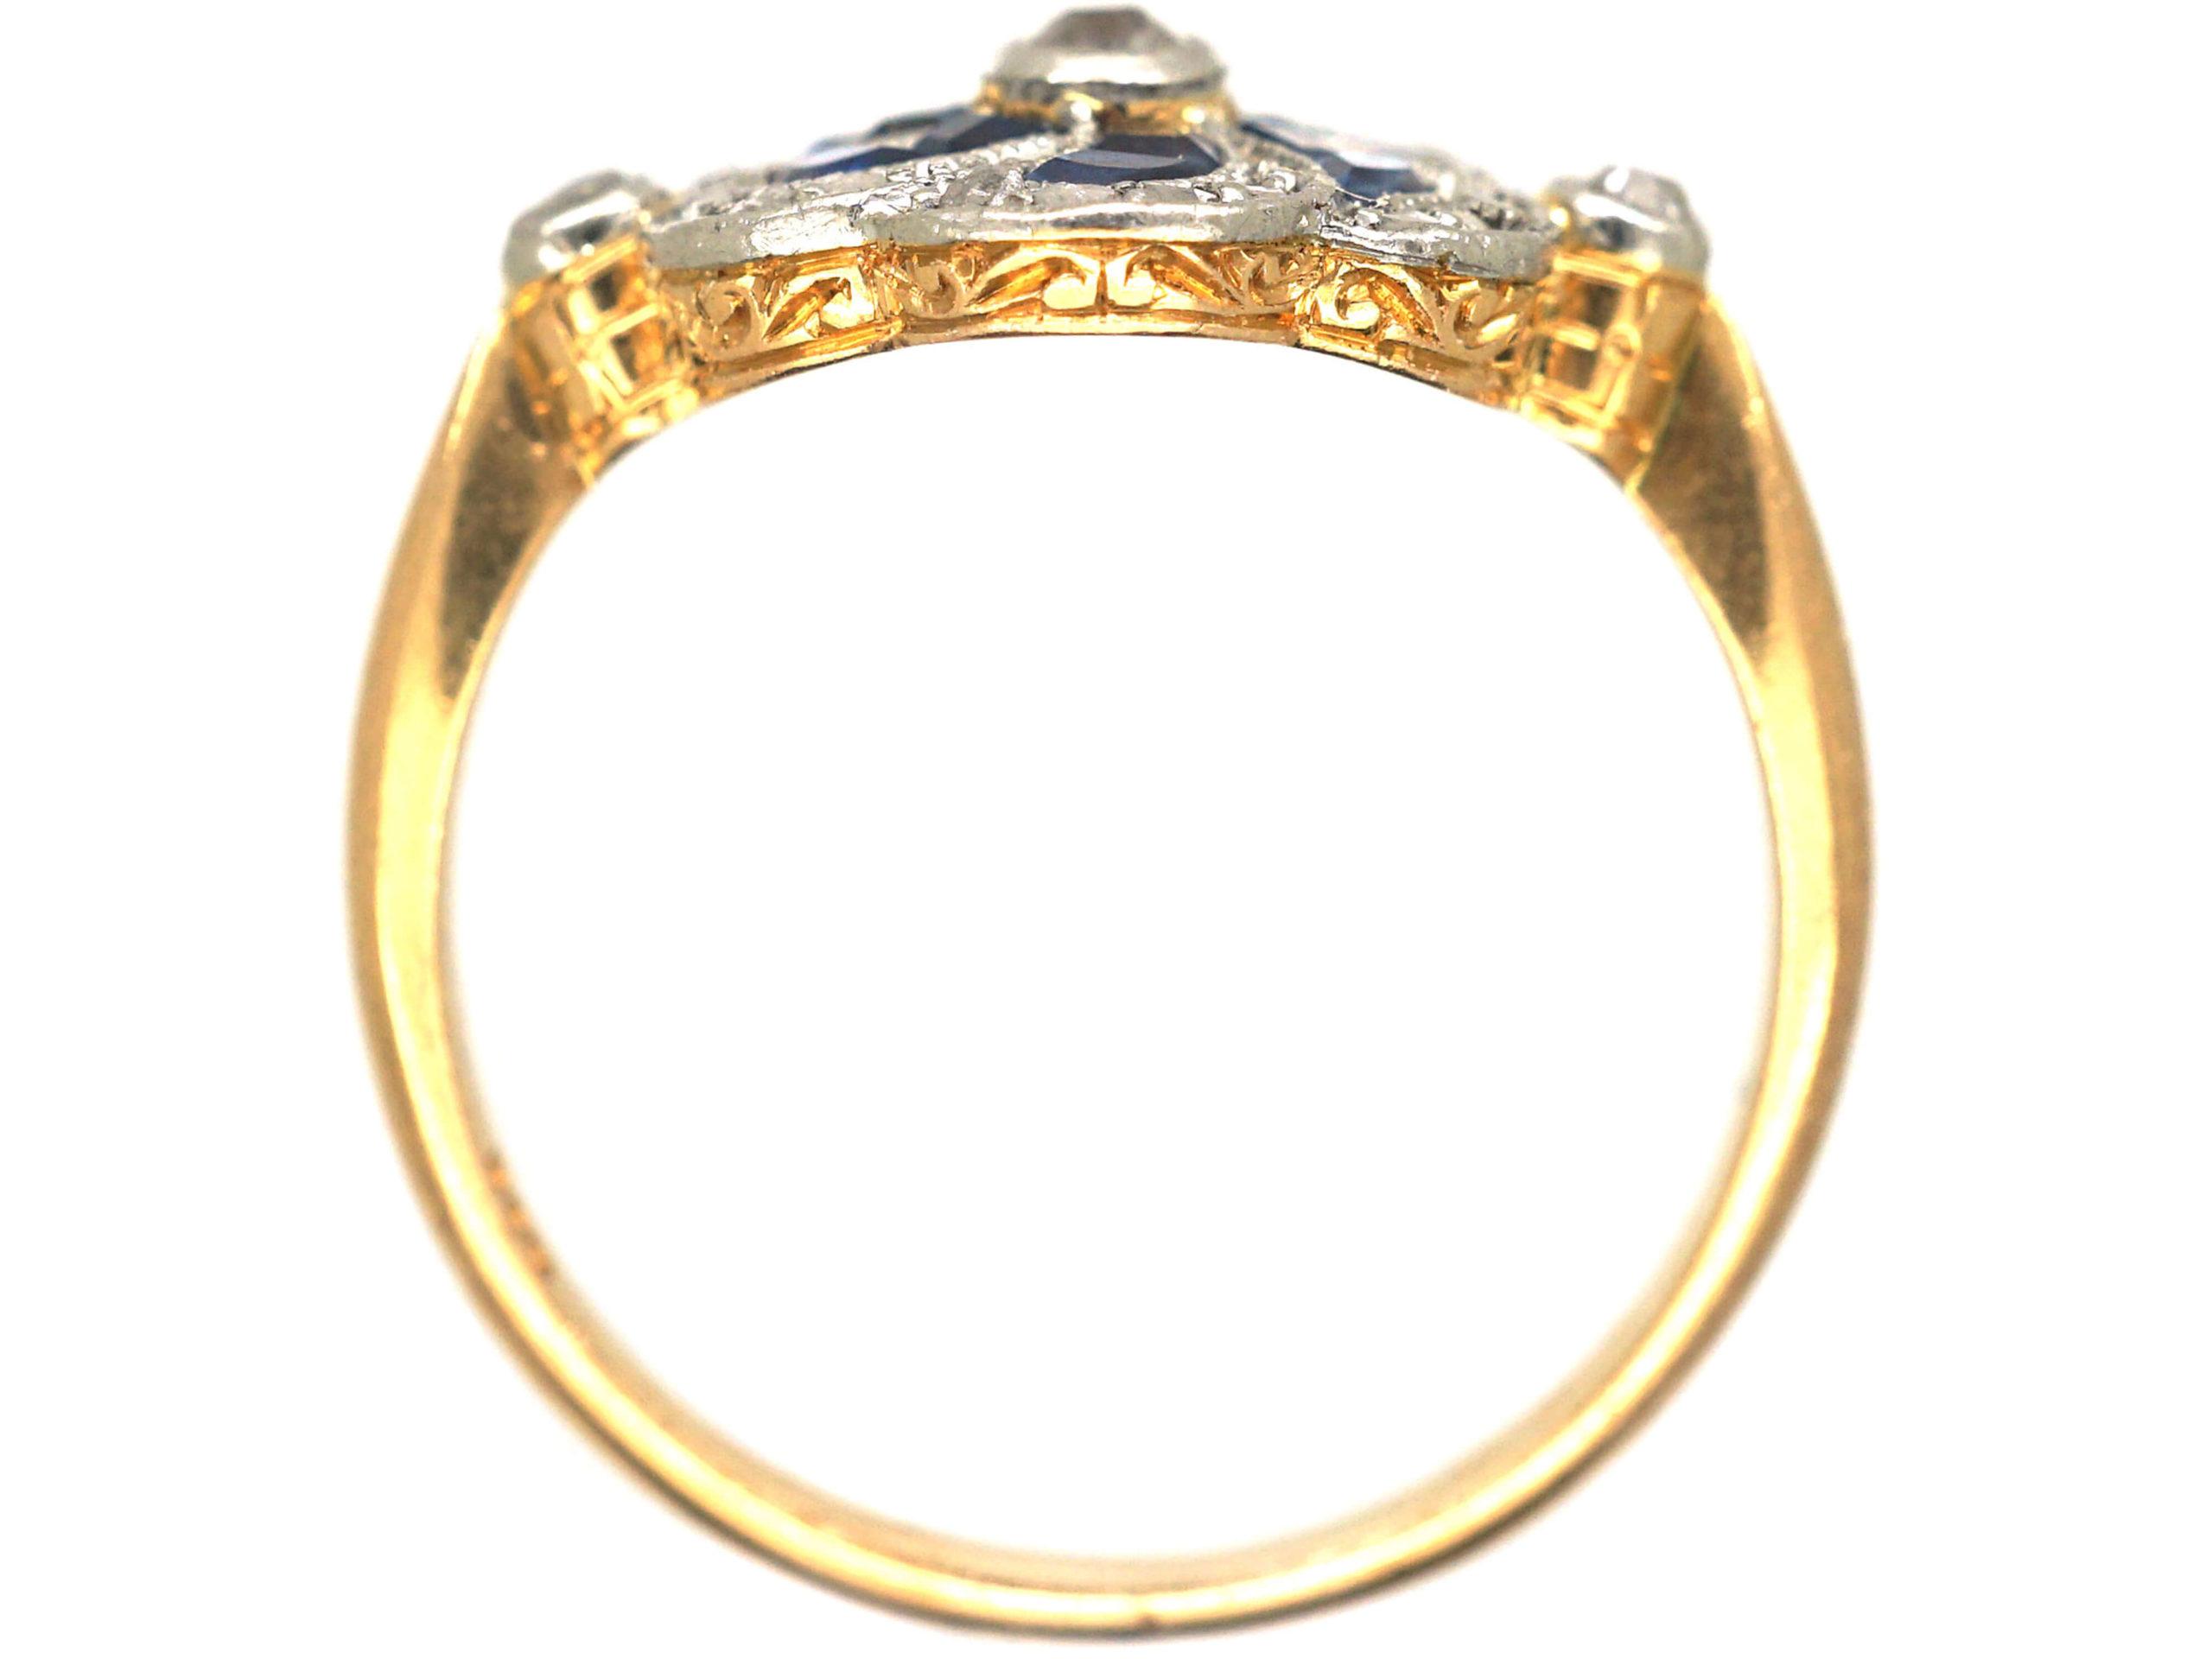 Edwardian 18ct Gold & Platinum Catherine Wheel Design Ring set with Sapphires & Diamonds